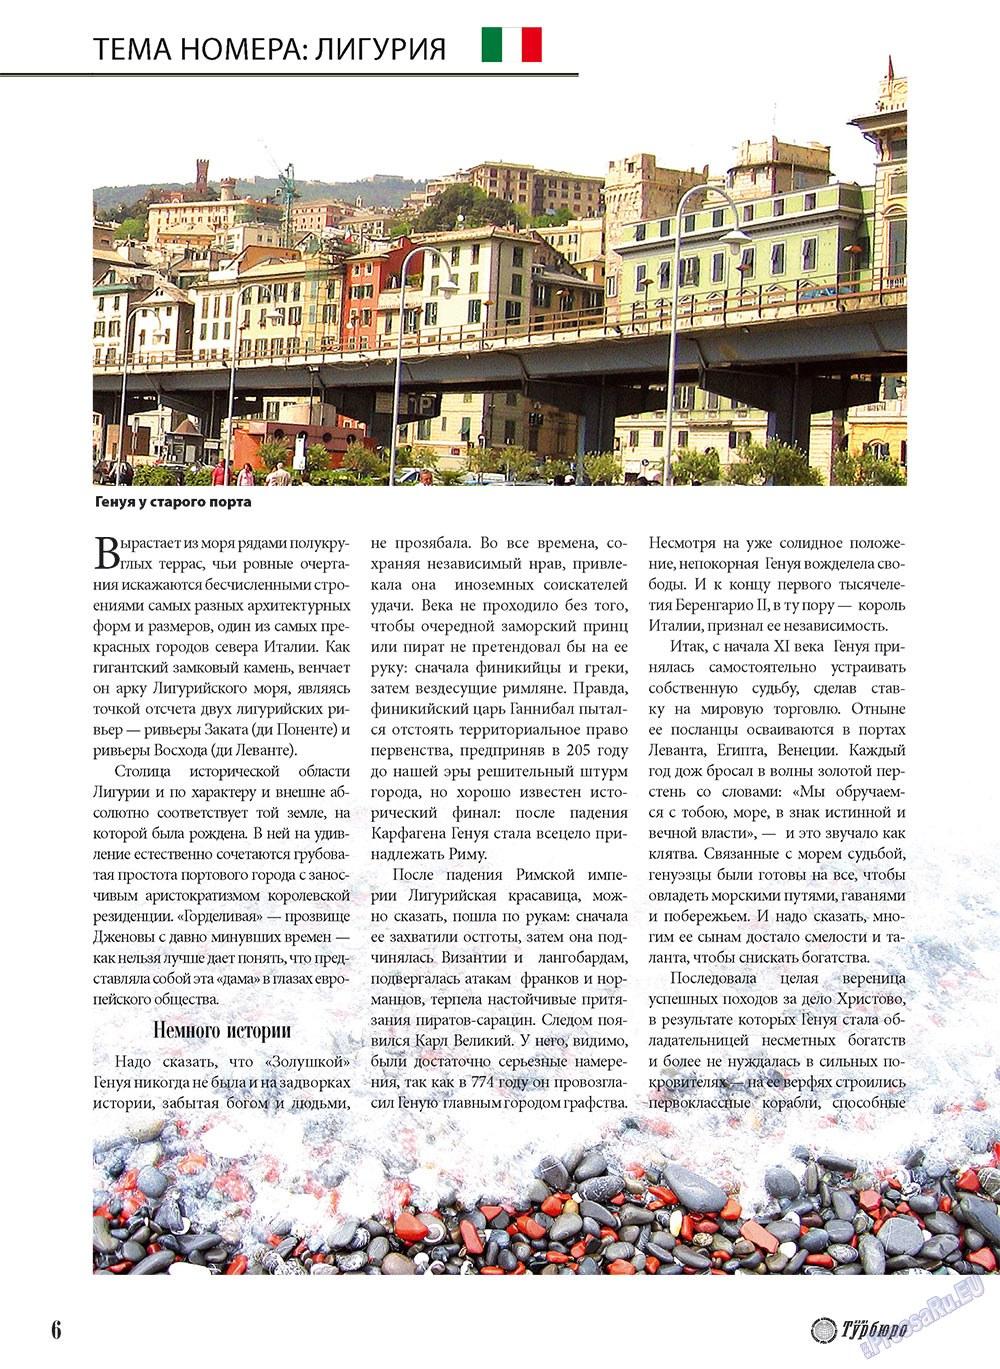 Наше Турбюро (журнал). 2010 год, номер 3, стр. 6